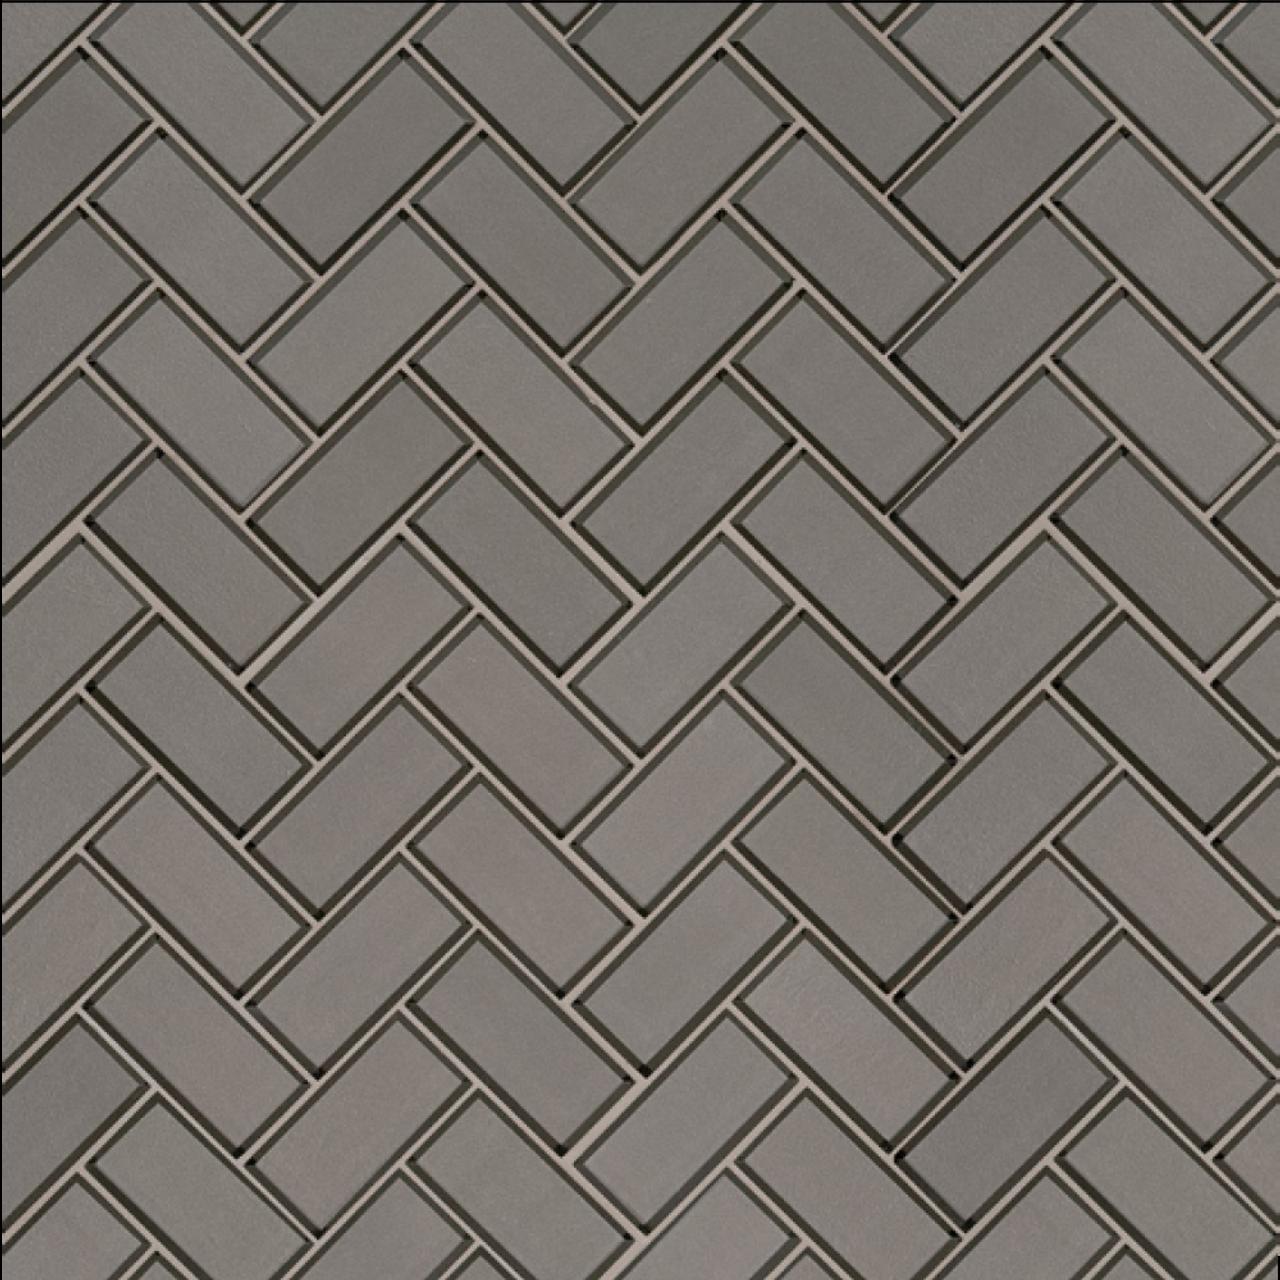 Ms International Glass Tile Series Champagne Bevel Herringbone Mosaic Tile Smot Gls Chbehb8mm Mosaicmosaic Com